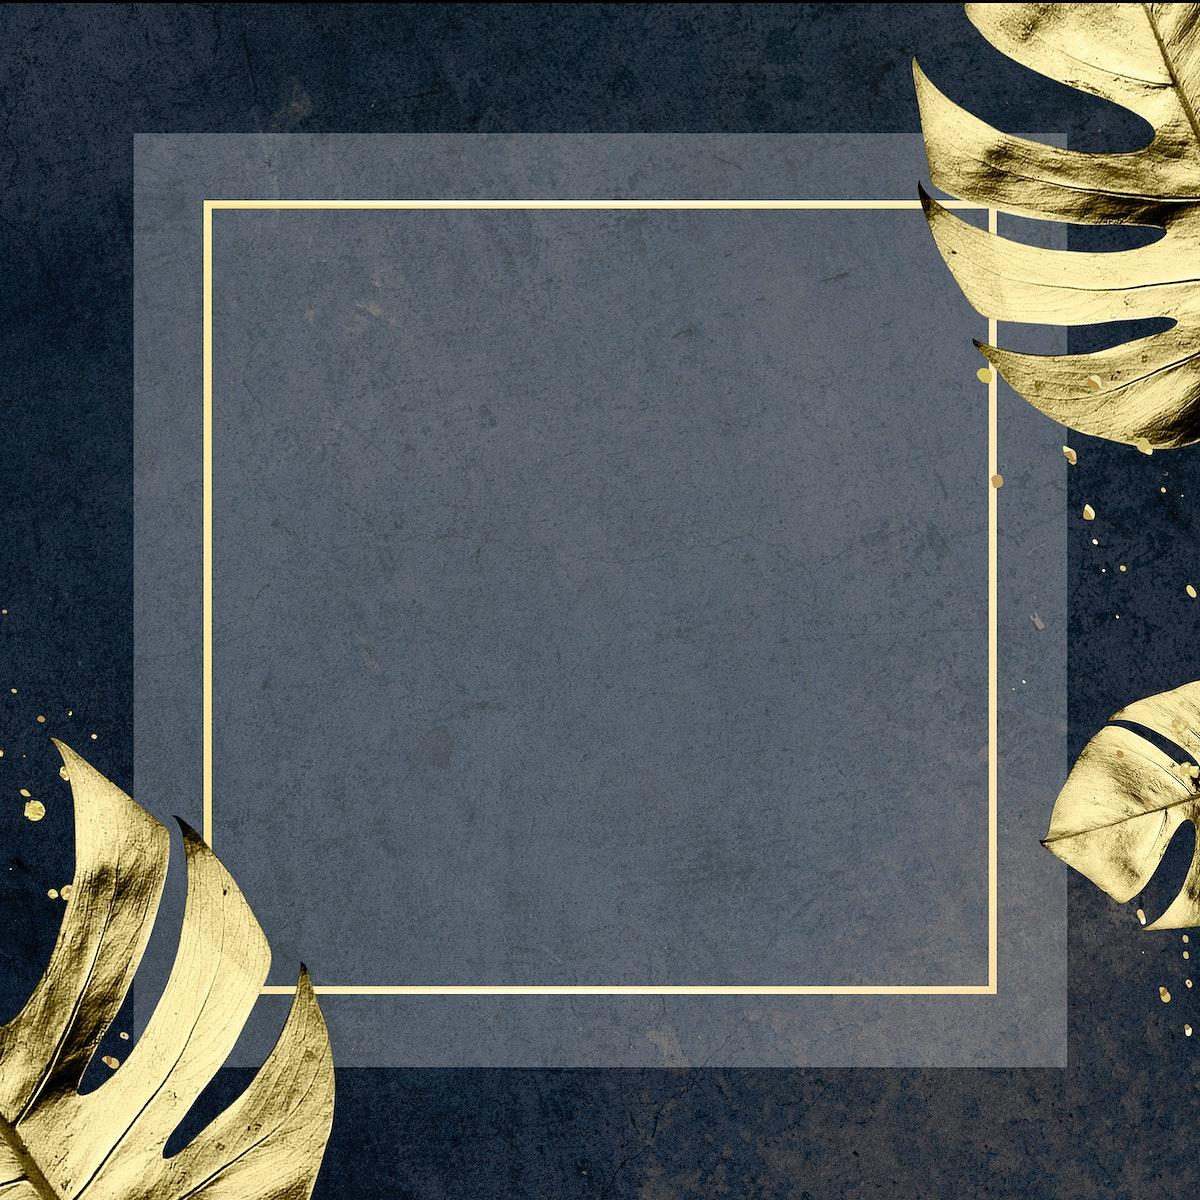 Golden Monstera leaves decorated blank frame